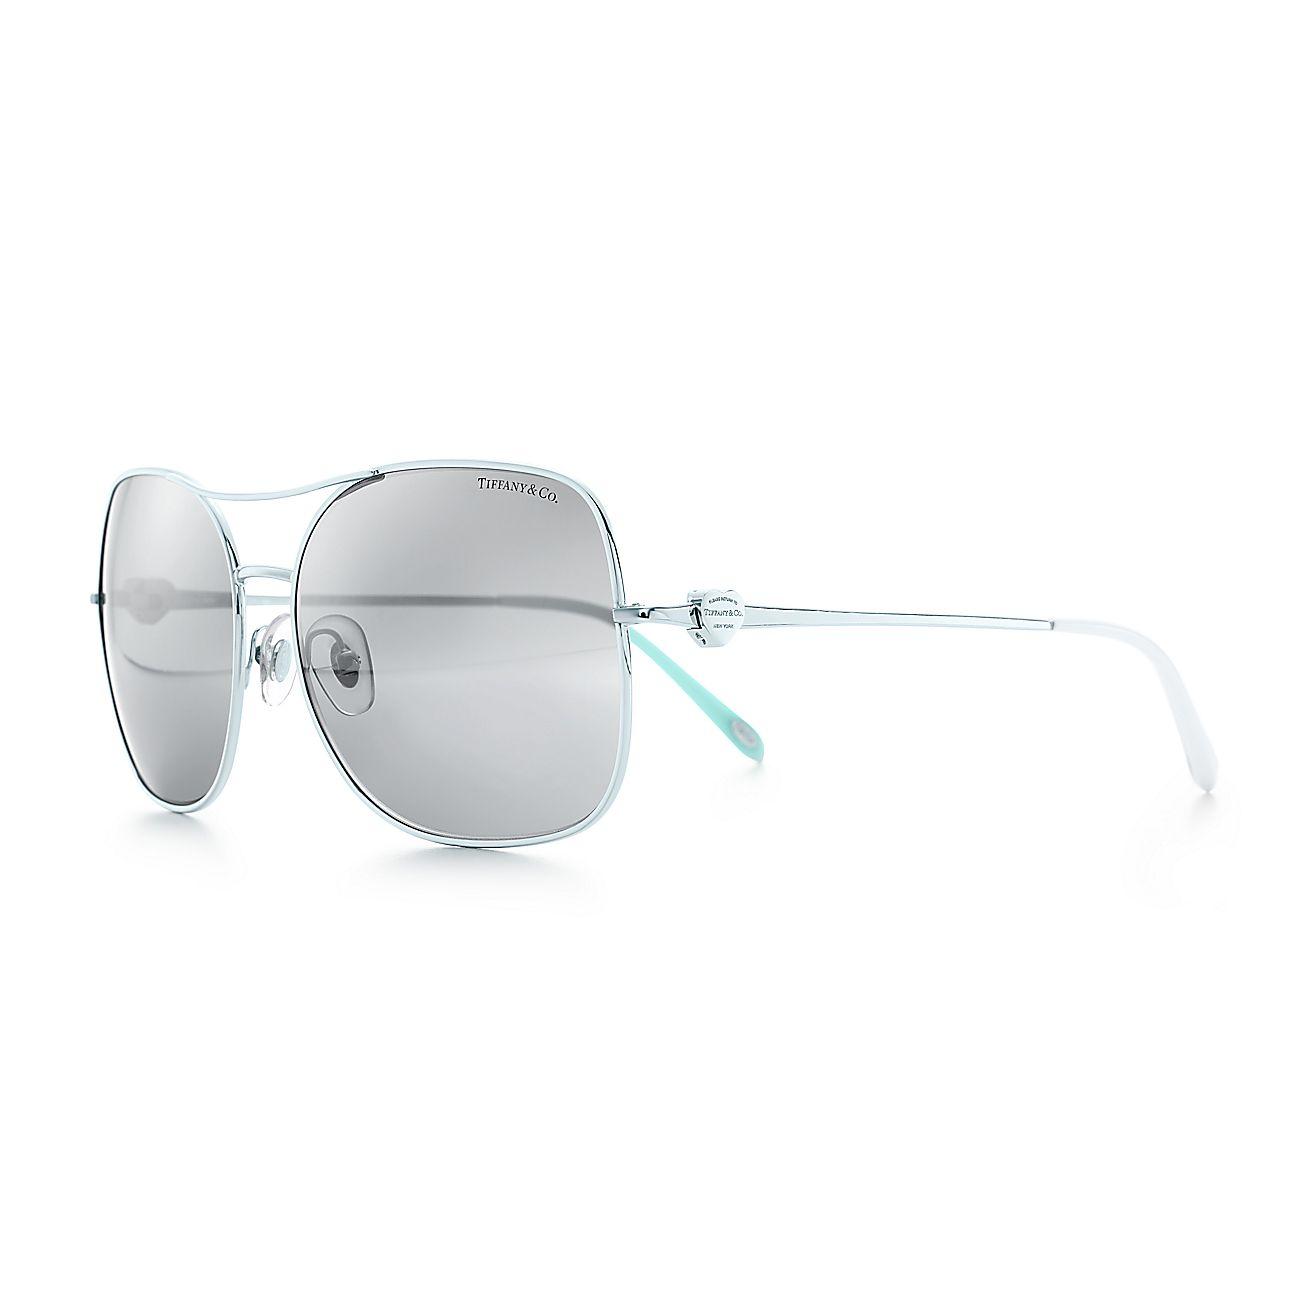 Return to Tiffany®:Aviator Sunglasses